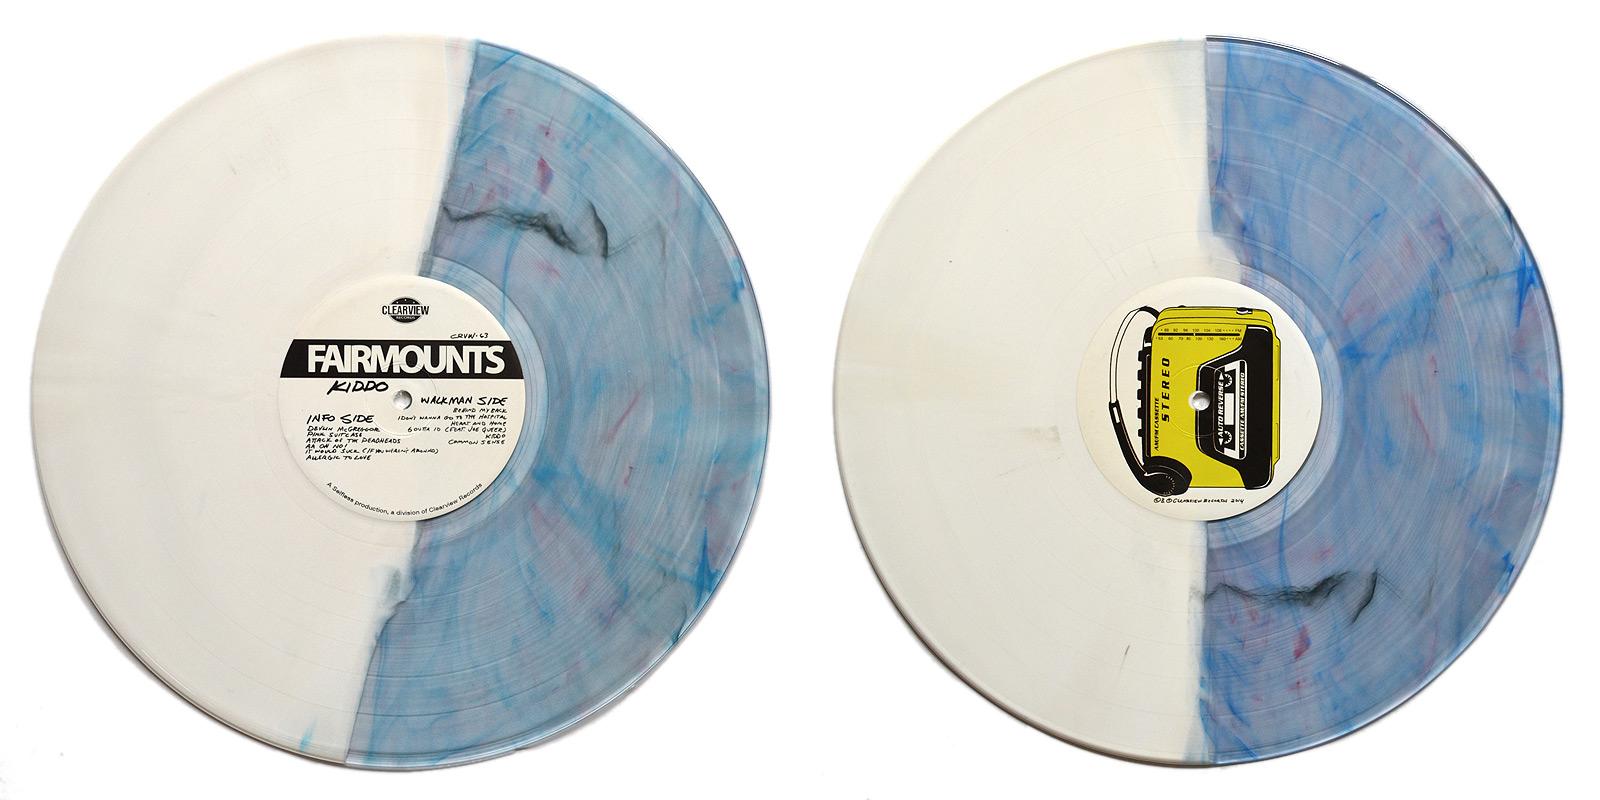 vinyl collector: